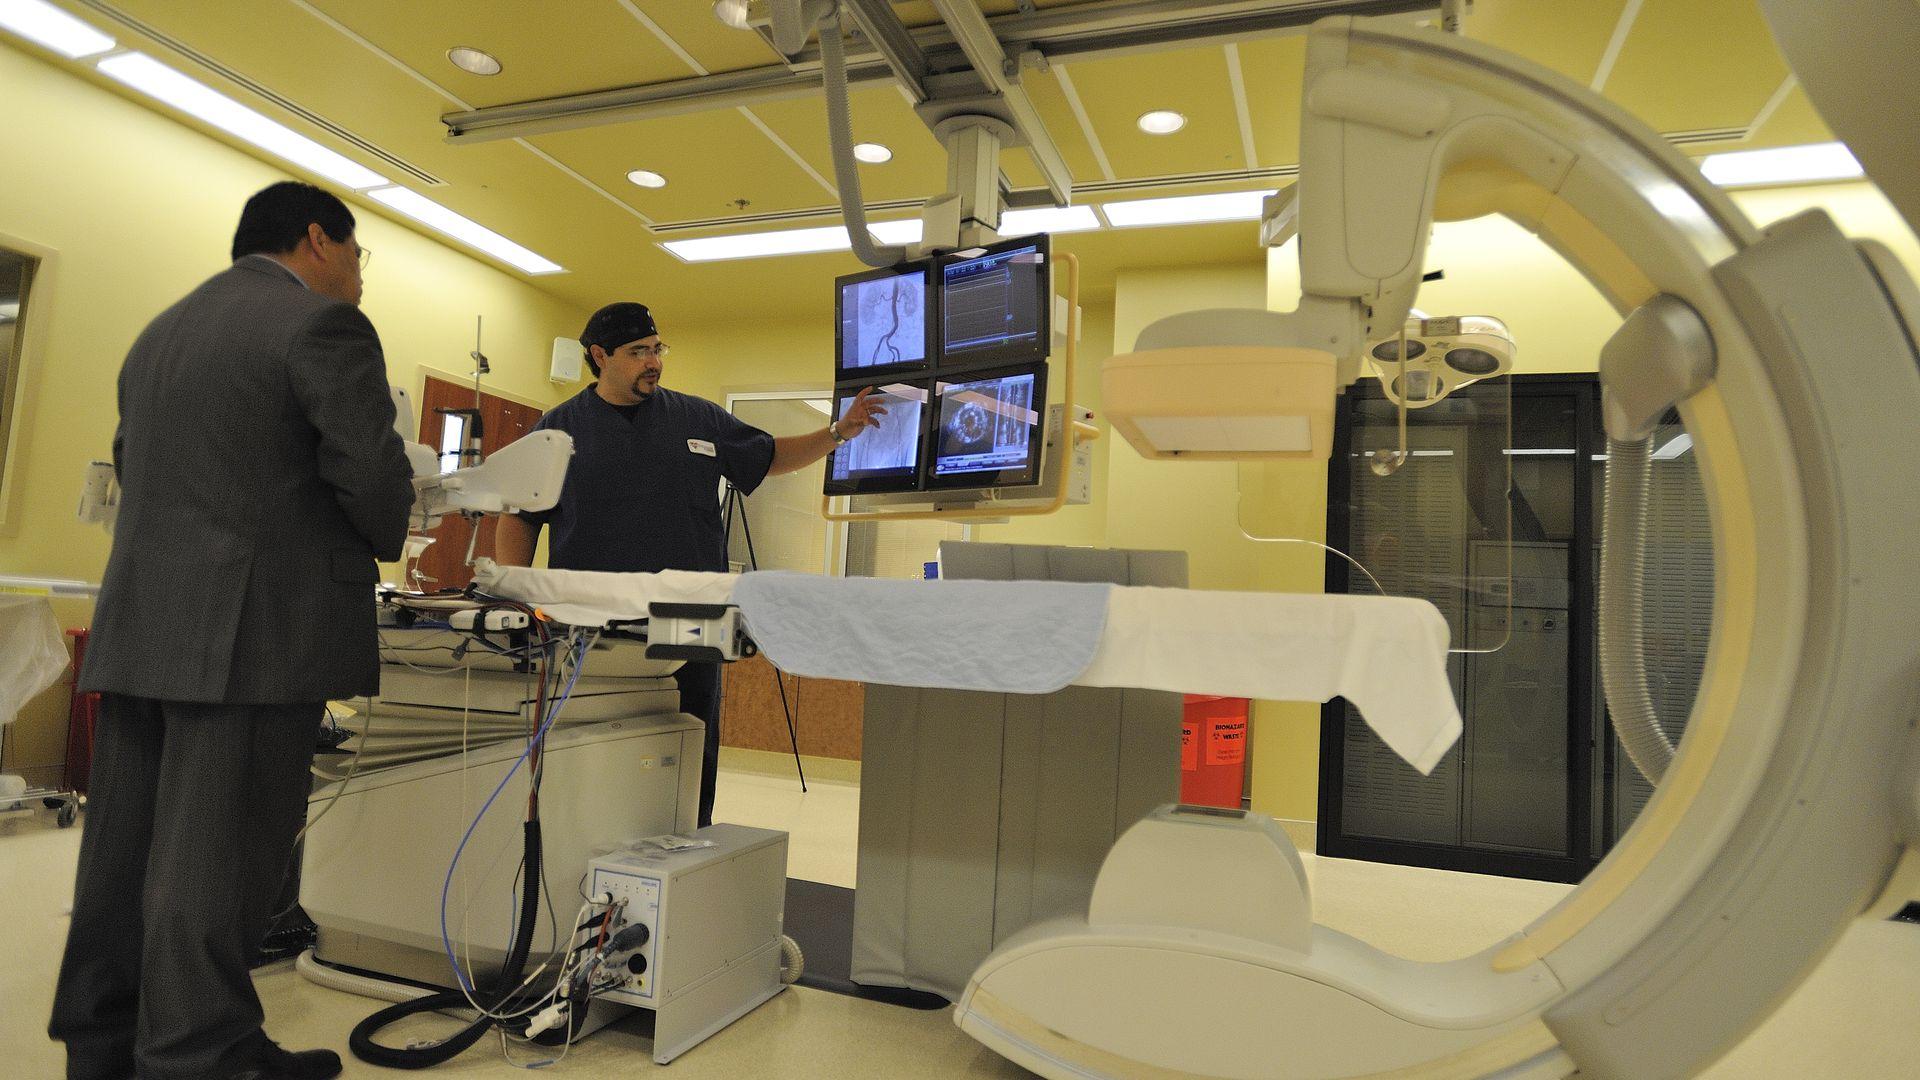 A health care technician points to computer screens near a cardiac cath machine.